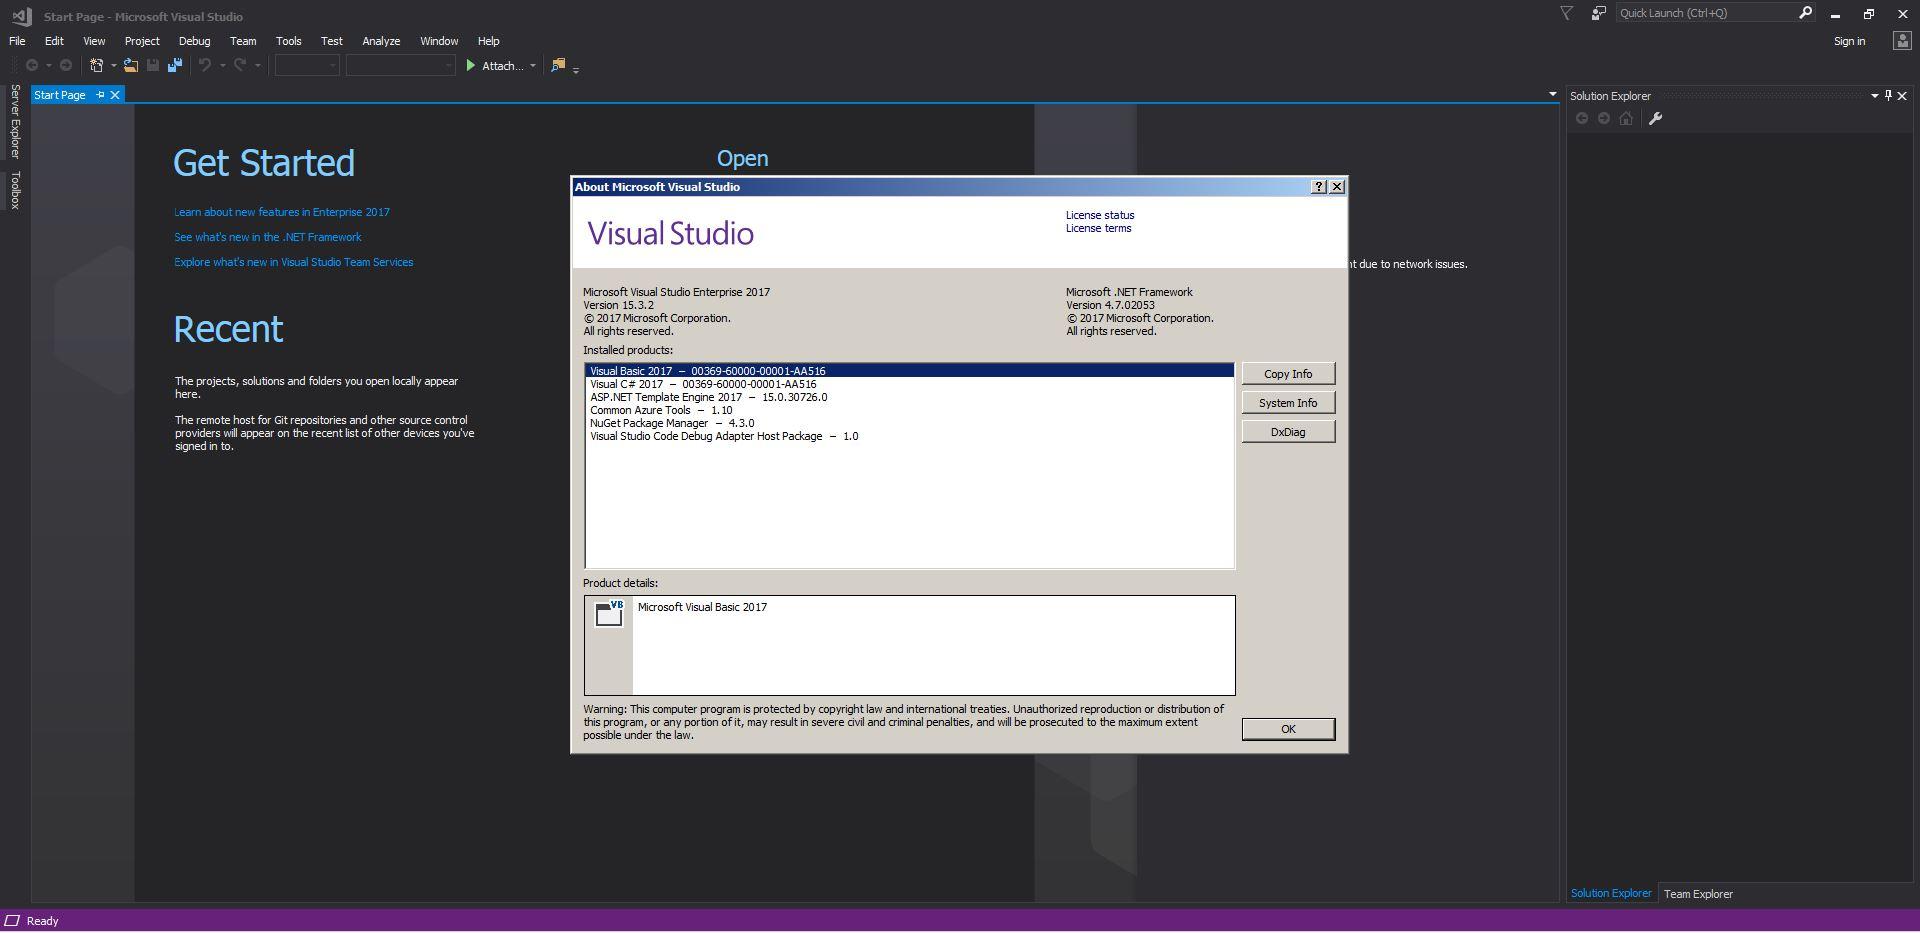 Microsoft Visual Studio 2017 Enterprise 15.3 (Offline Cache, Unofficial) (2017) Английский / Русский